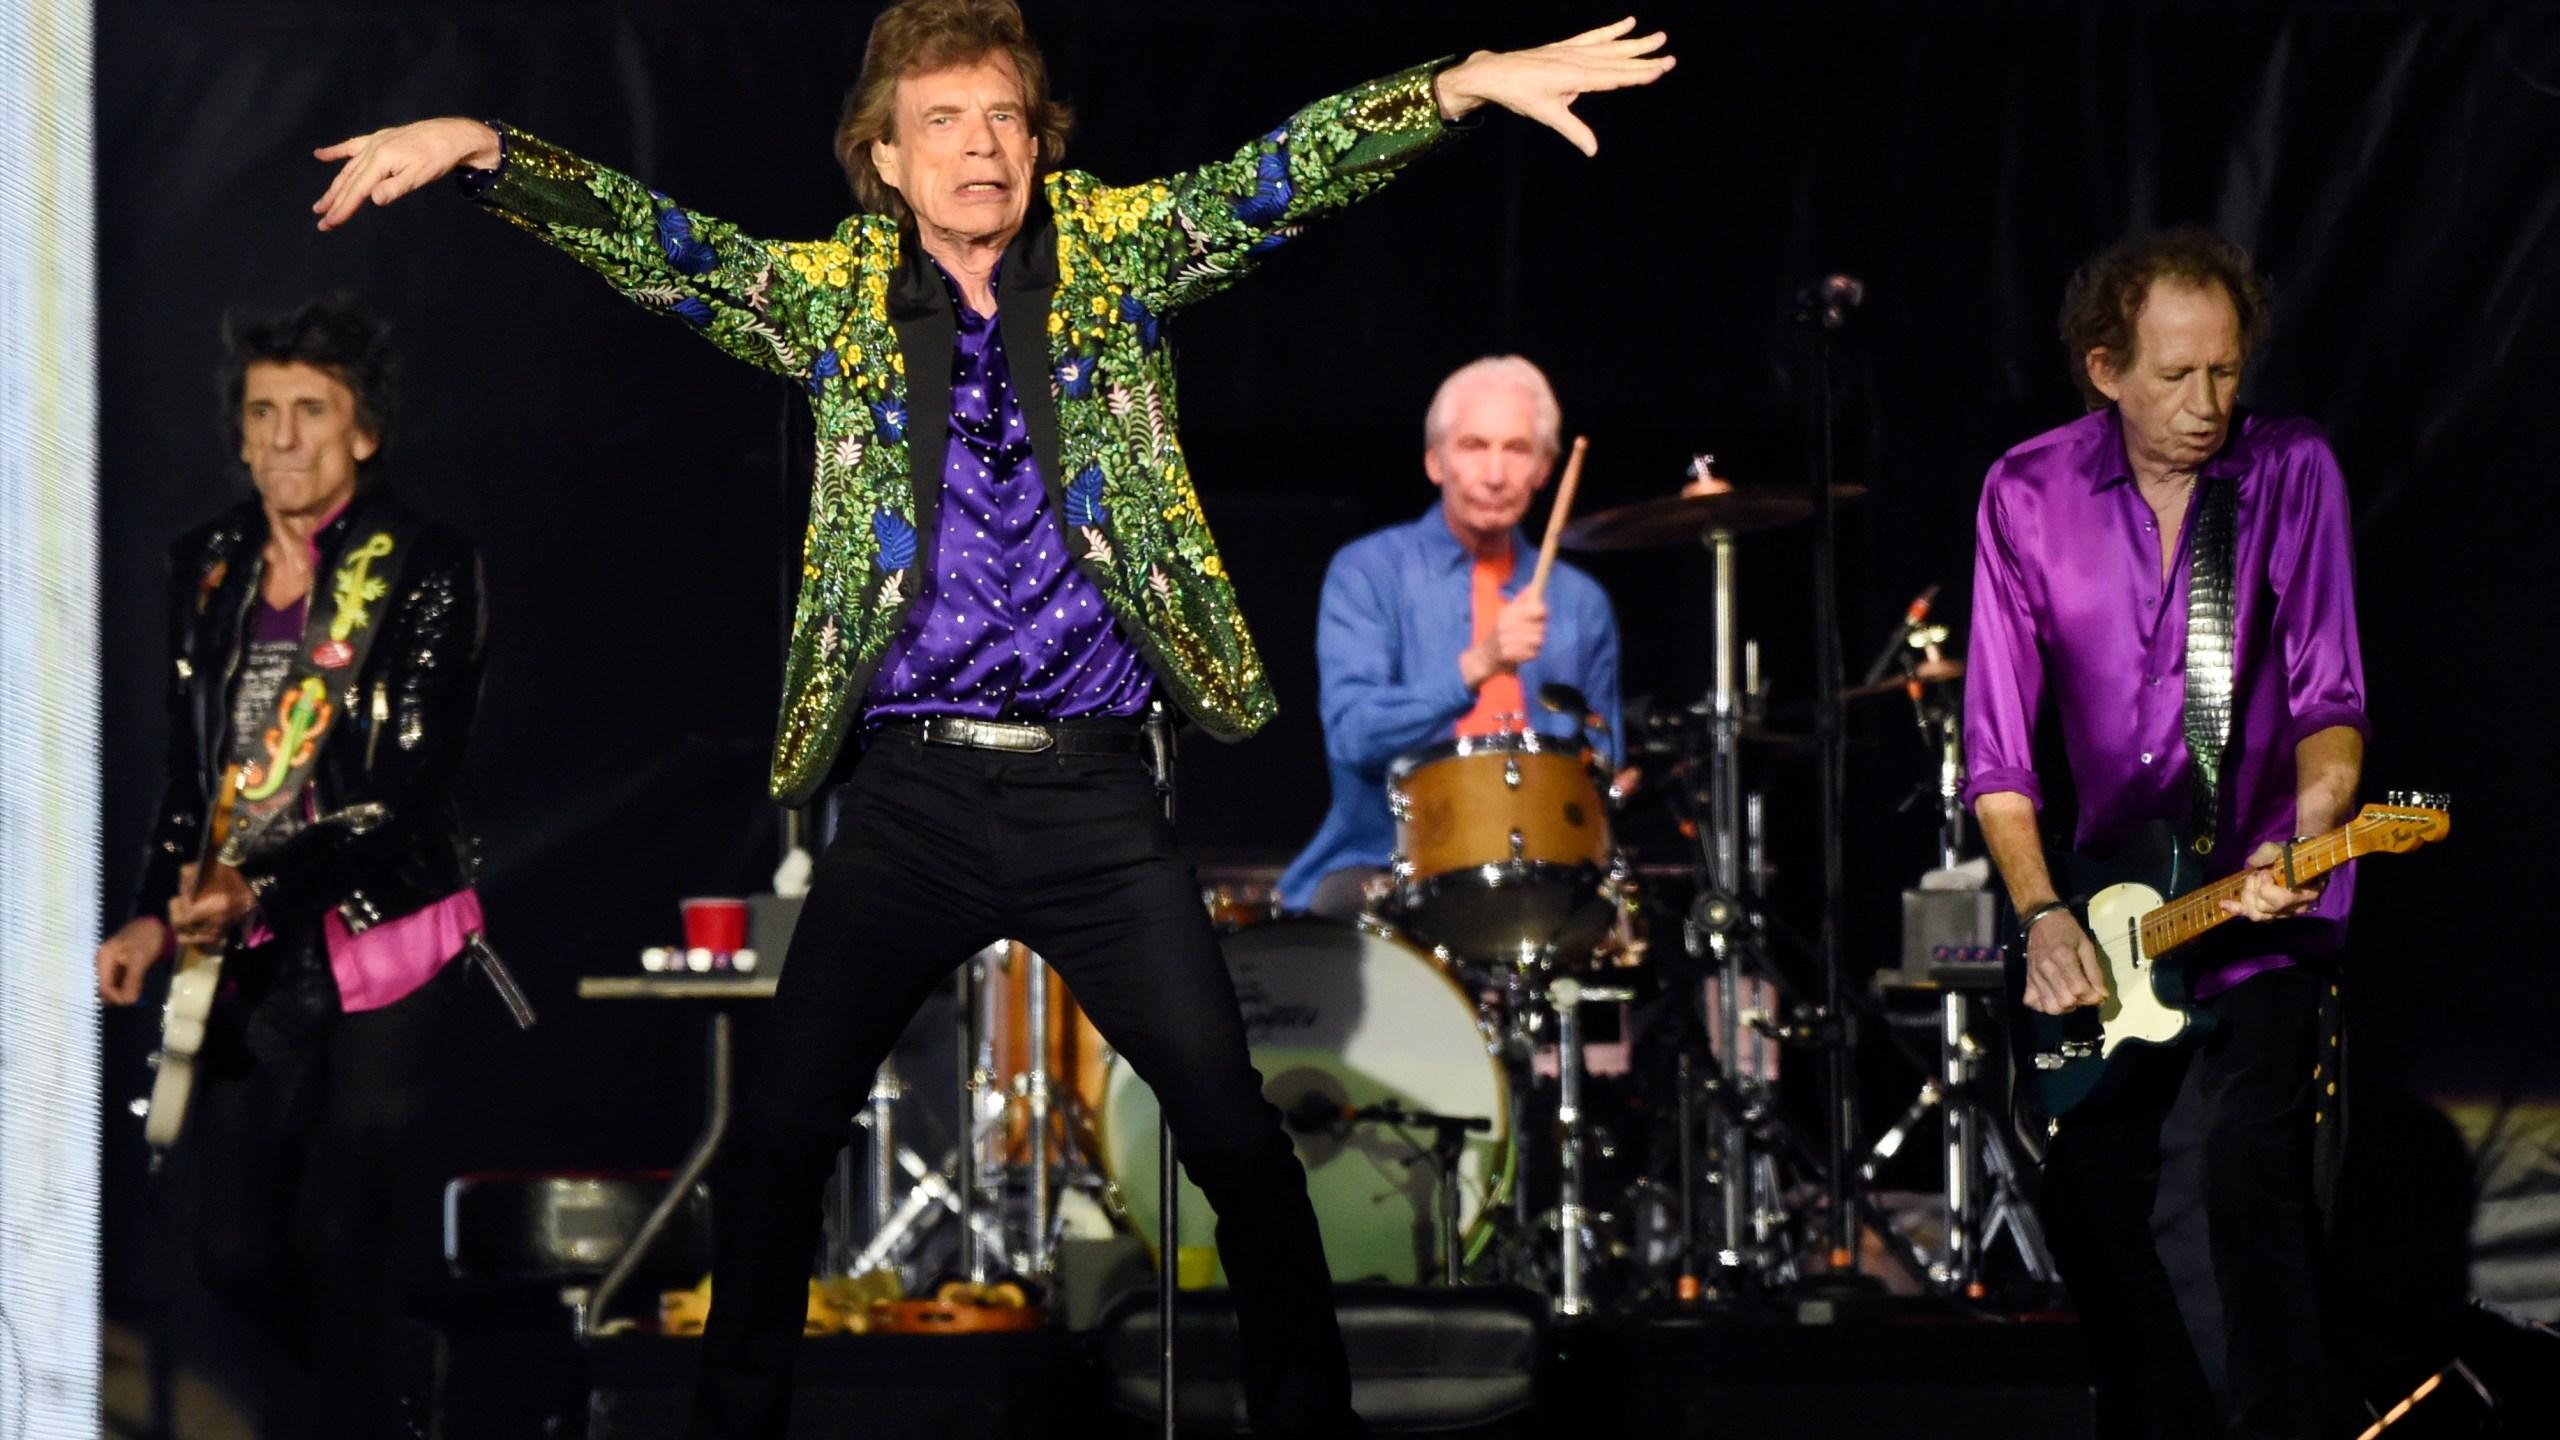 Ron Wood, Mick Jagger, Charlie Watts, Keith Richards